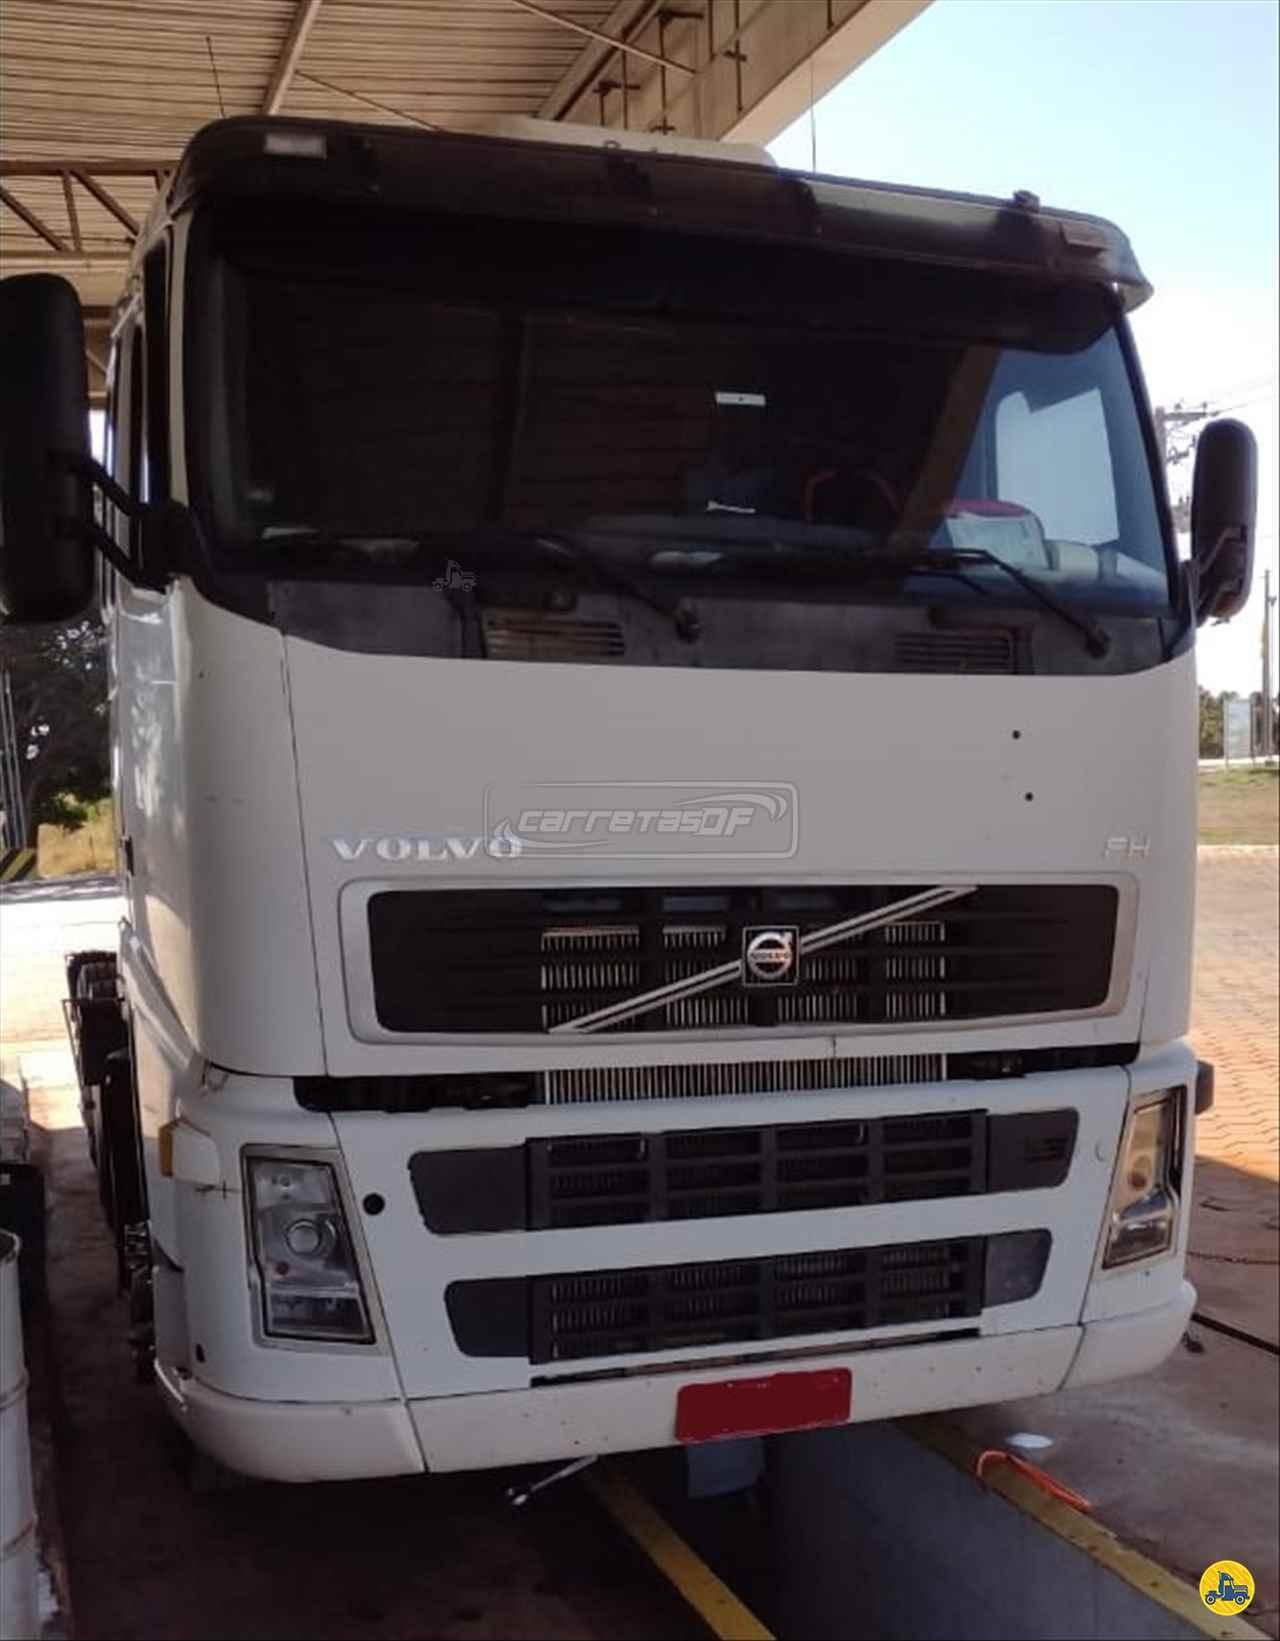 CAMINHAO VOLVO VOLVO FH 420 Cavalo Mecânico Truck 6x2 CARRETAS DF - NOMA BRASILIA DISTRITO FEDERAL DF